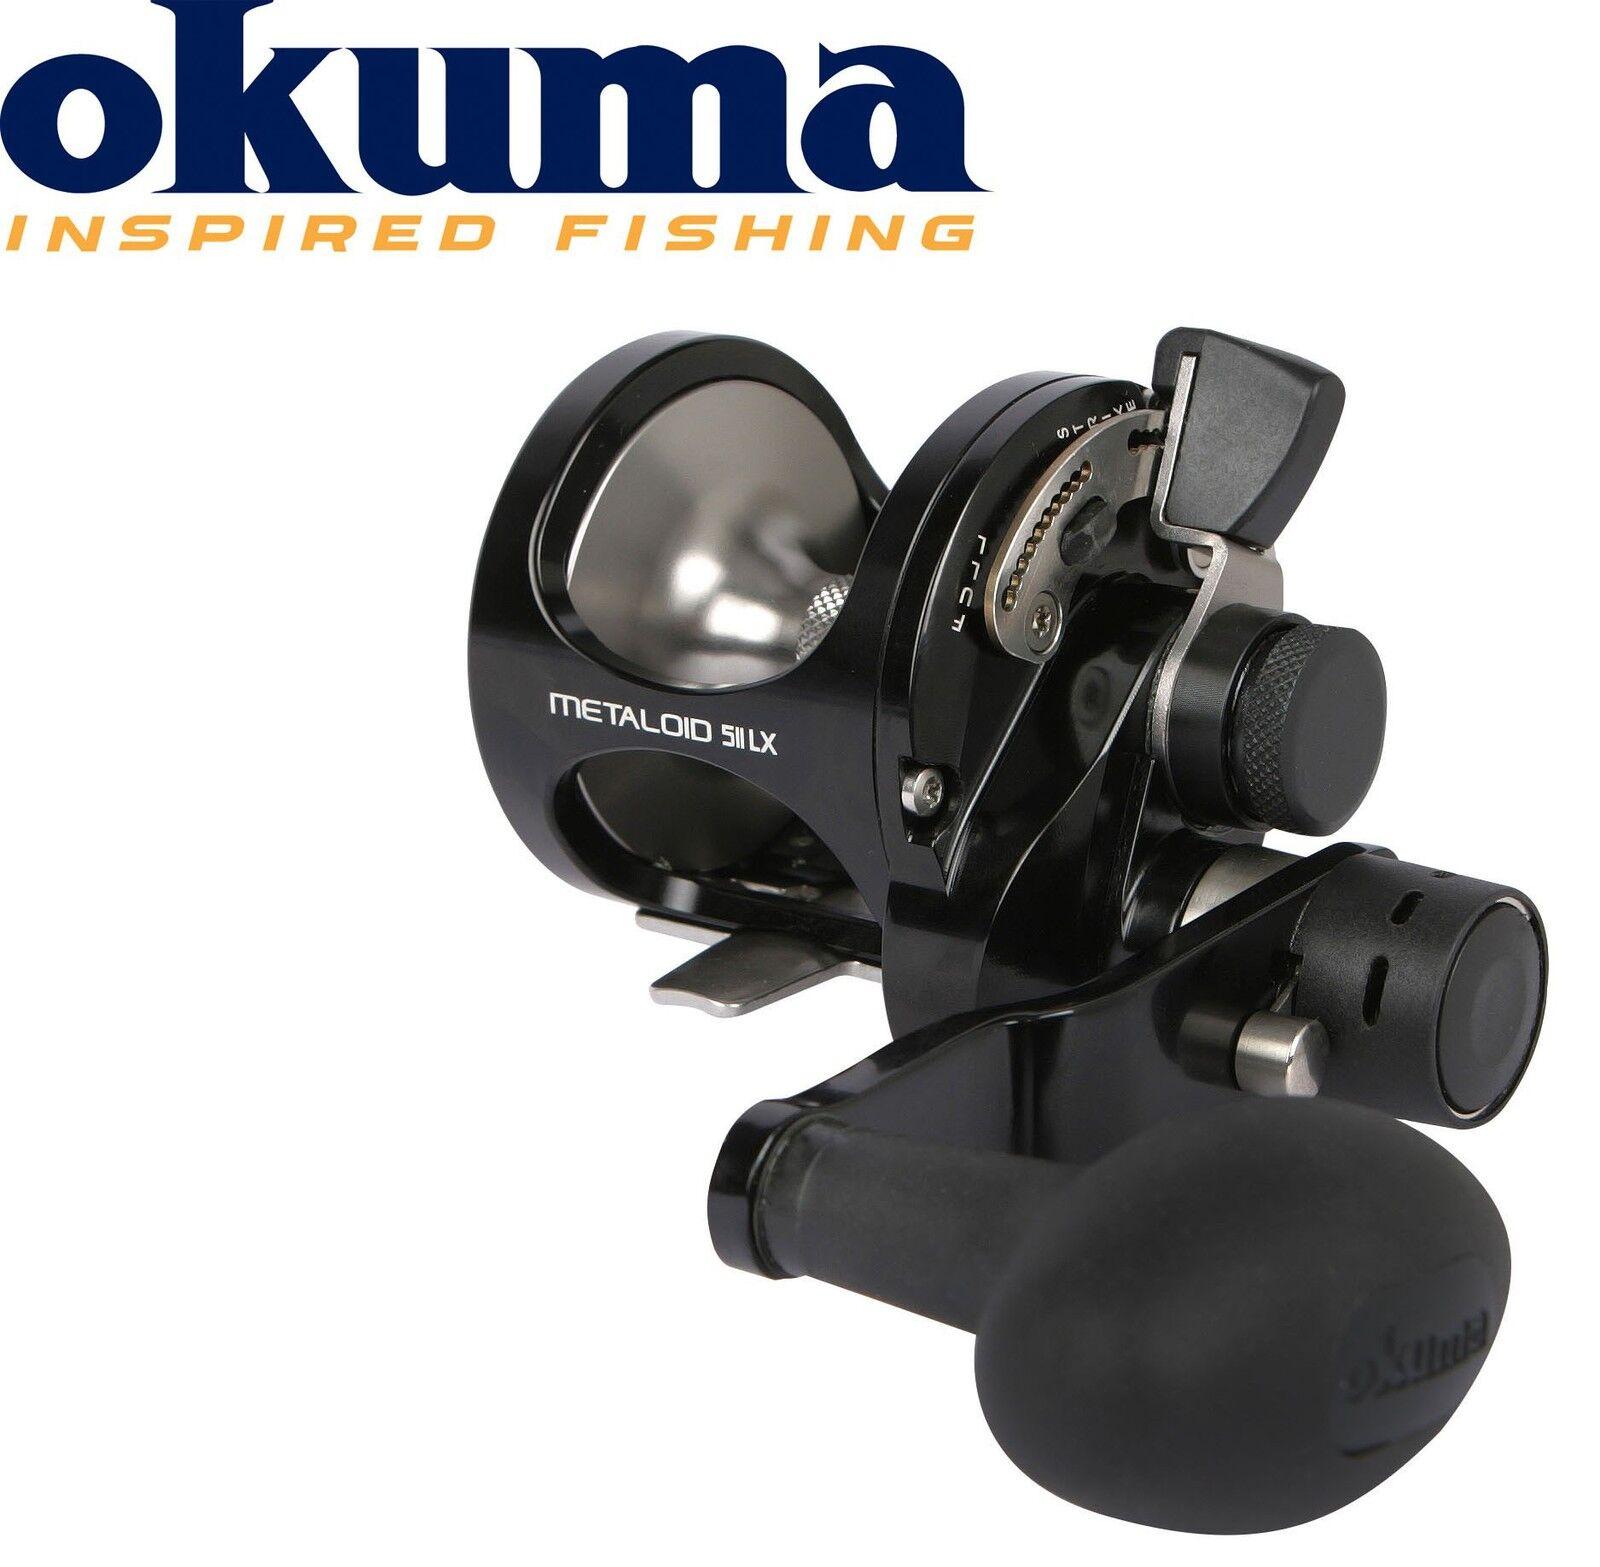 Okuma Metaloid Metaloid Okuma M-5IILX 4bb 2 Speed Left Hand Multirolle Linkshand, Meeresrolle 1c117d